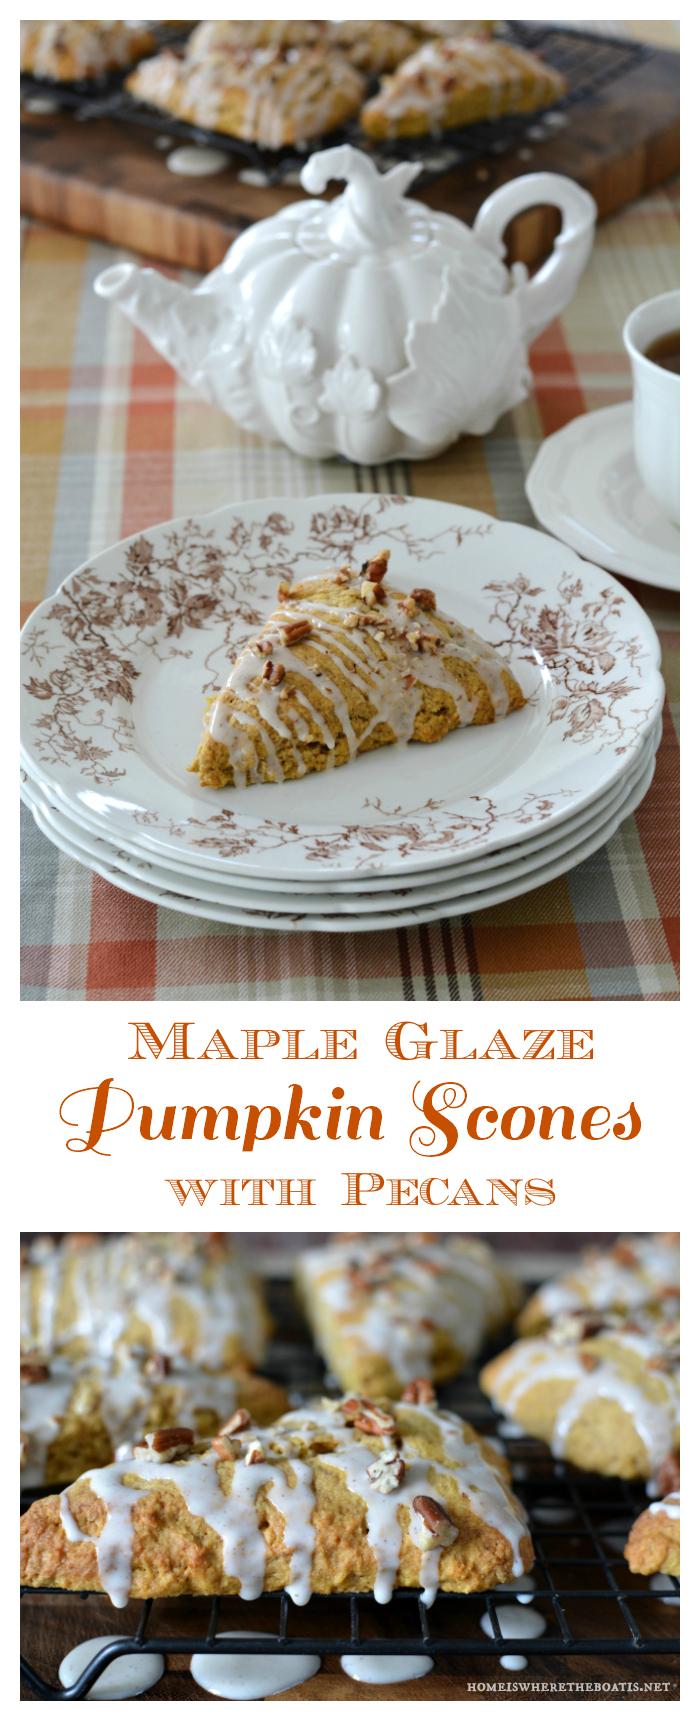 Maple Glaze Pumpkin Scones with Pecans | ©homeiswheretheboatis.net #fall #recipe #tea #pumpkin